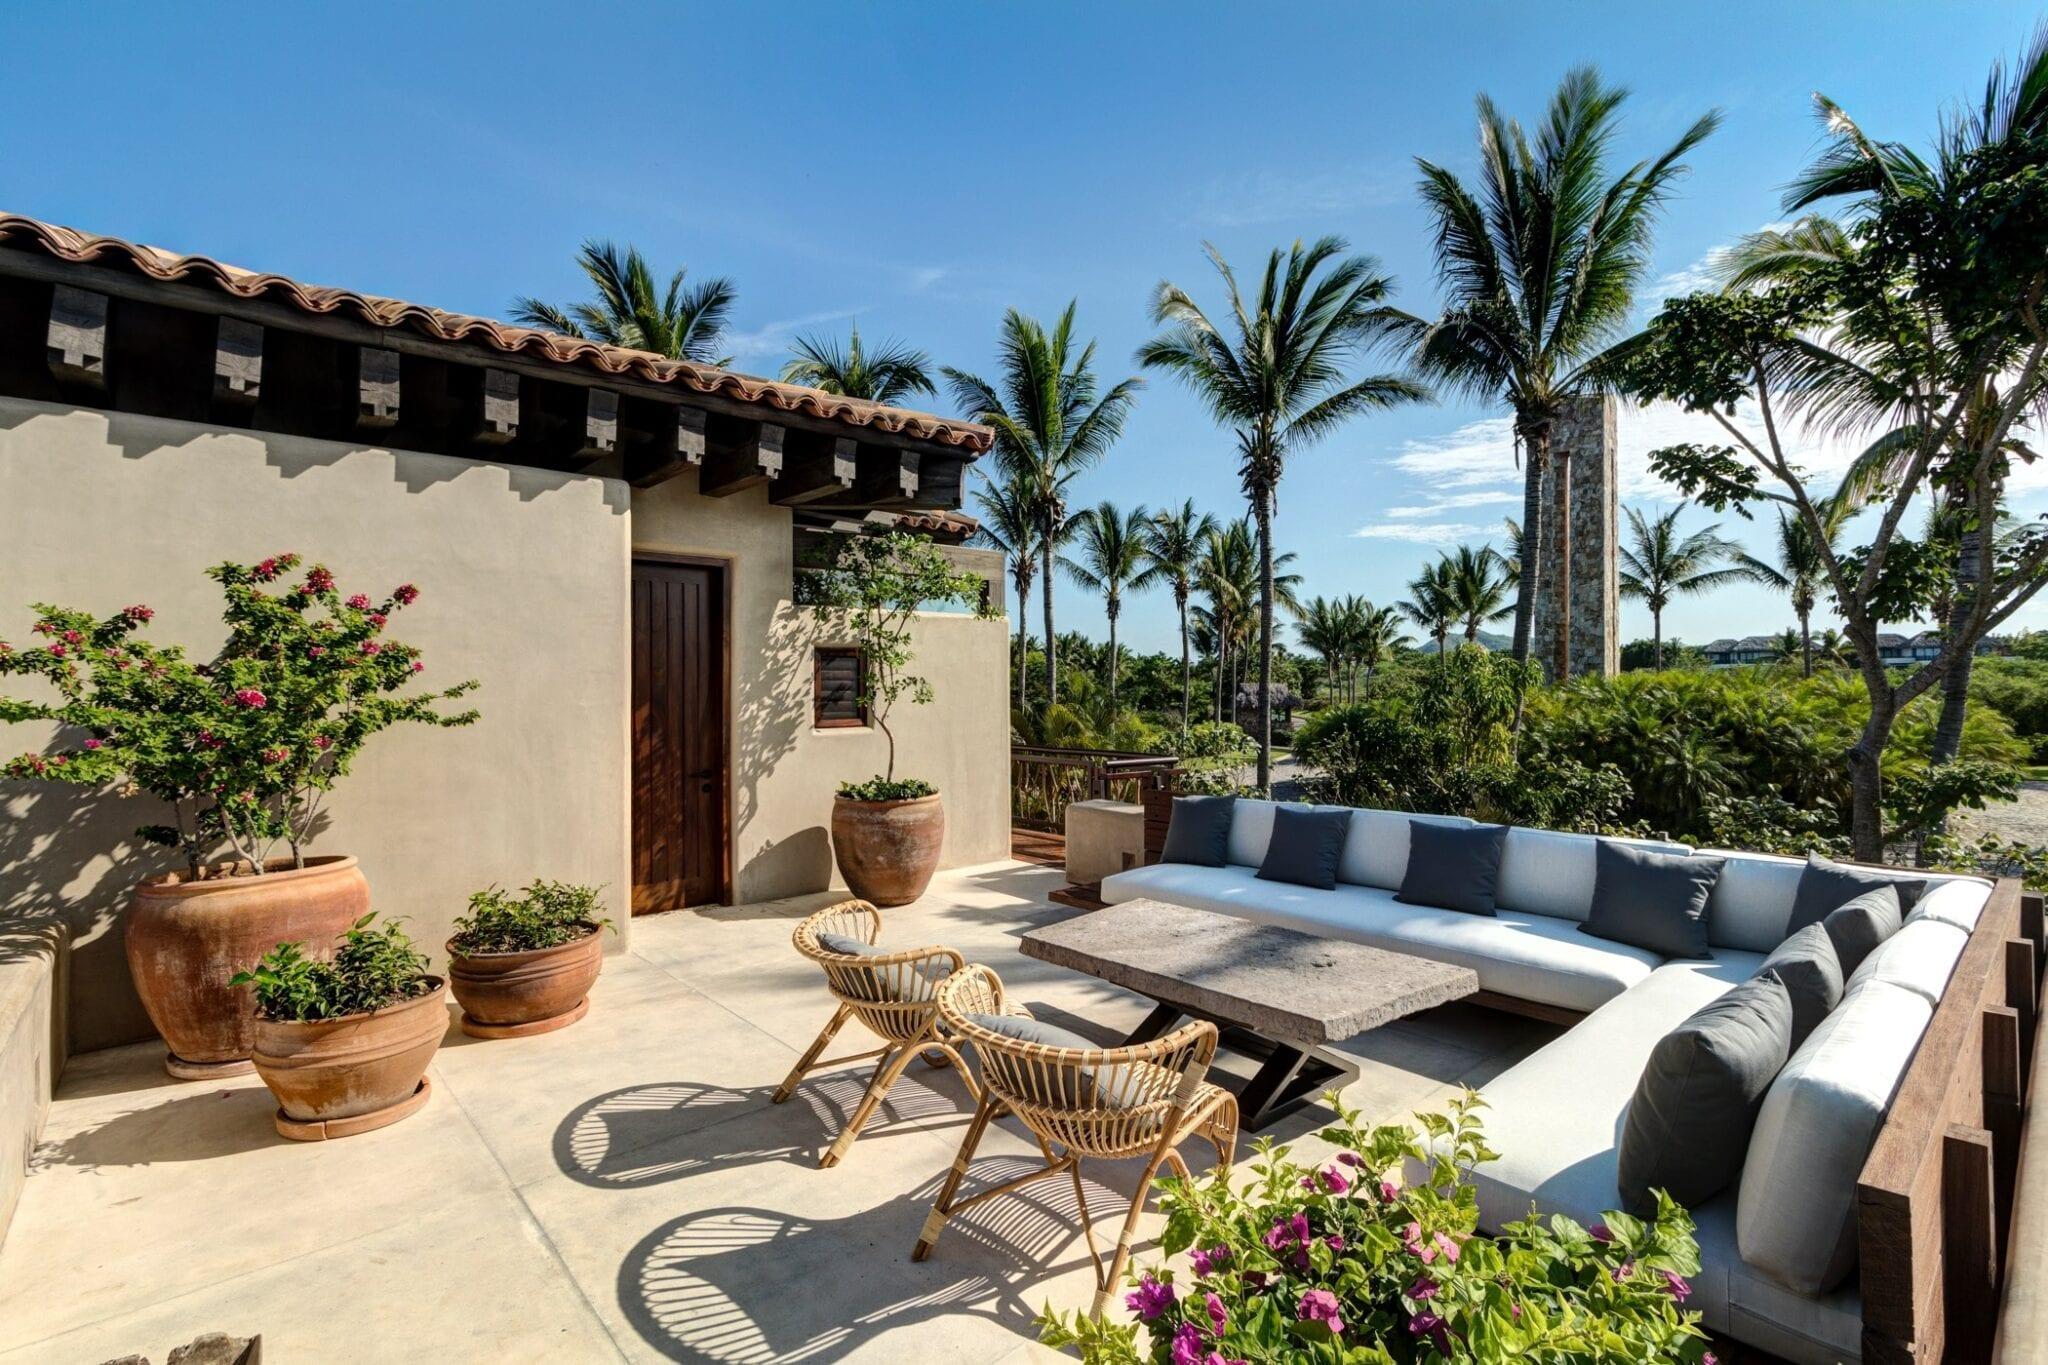 Casa Koko Outdoor Lounge